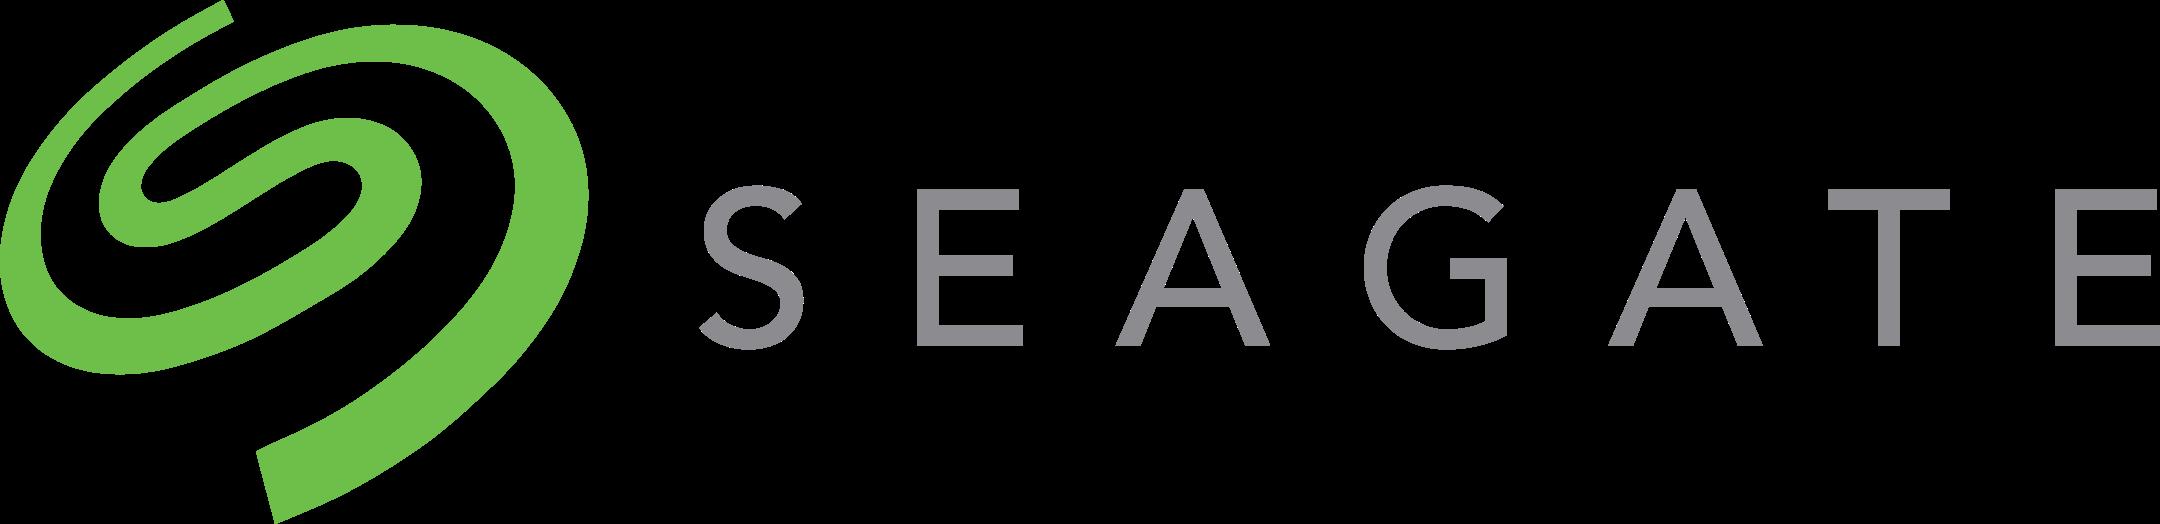 seagate logo 1 1 - Seagate Logo